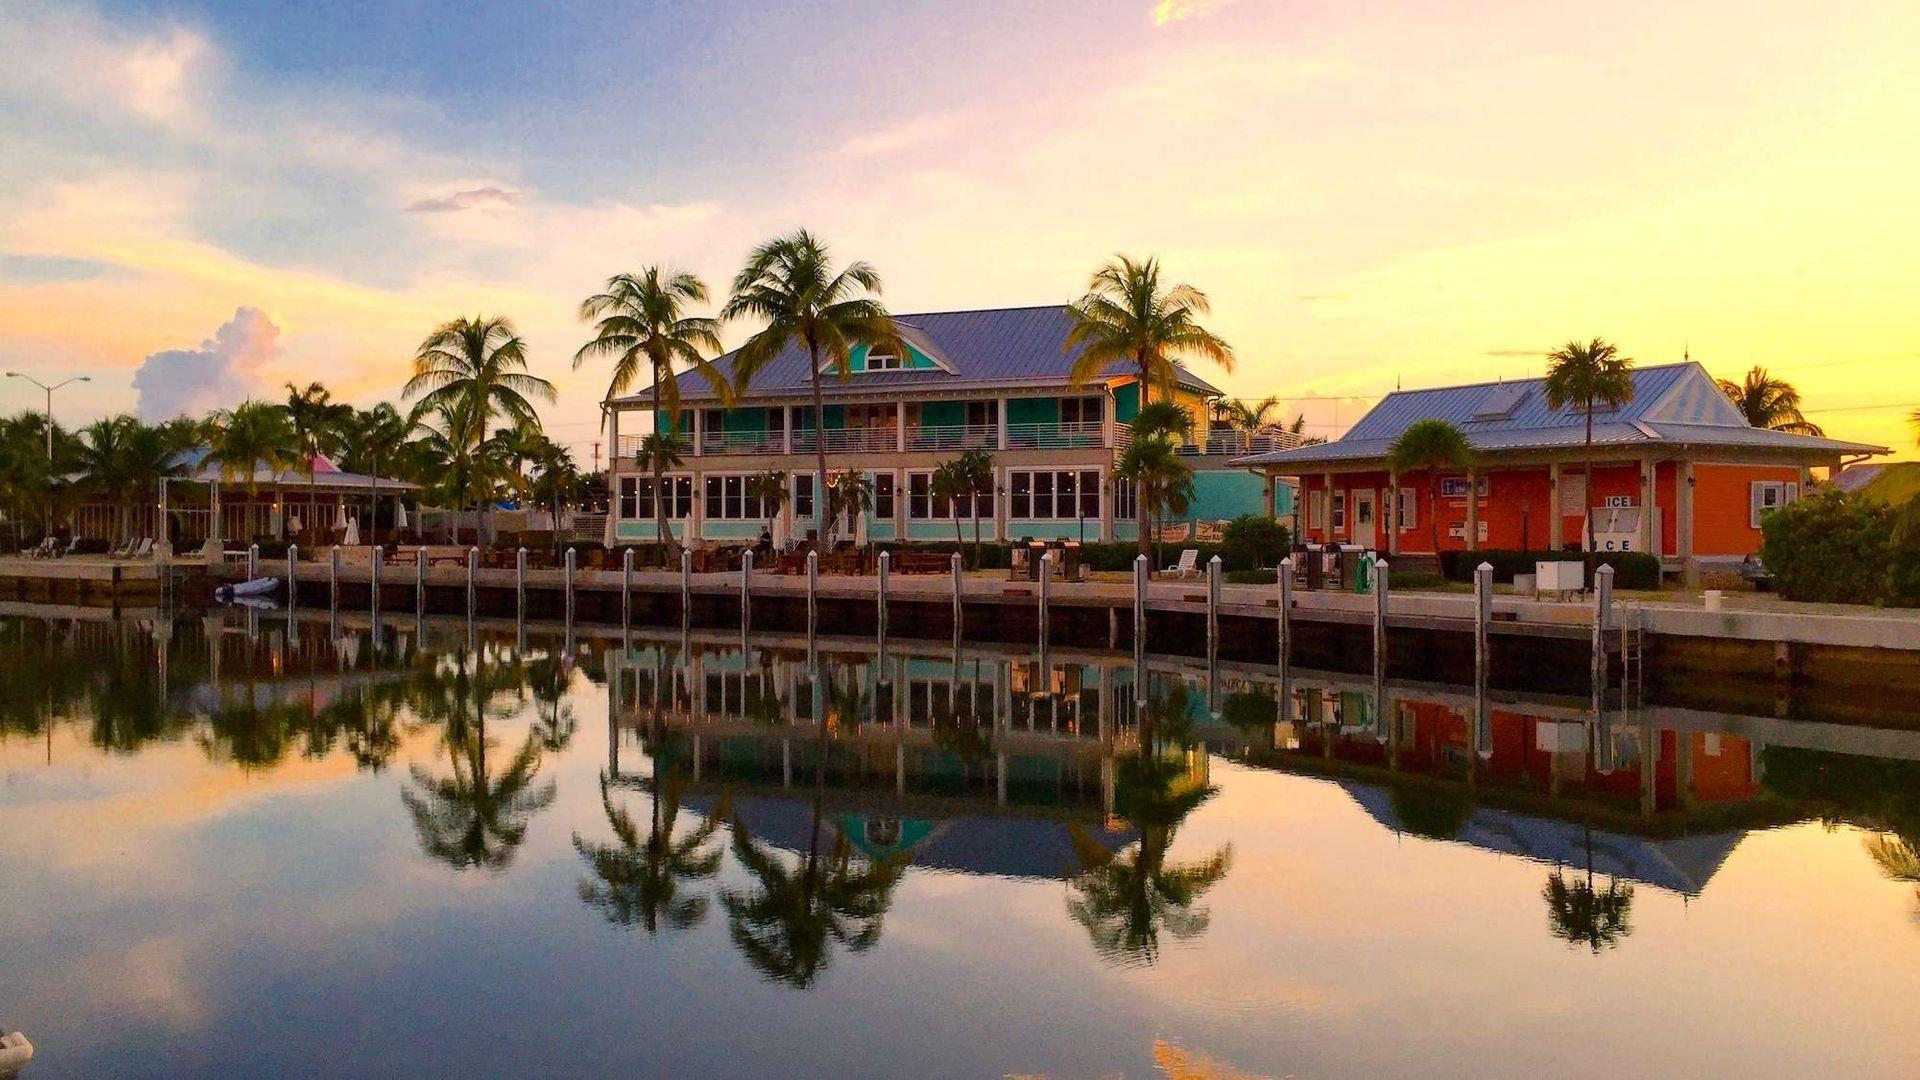 G.T. Yacht Club & Development Site